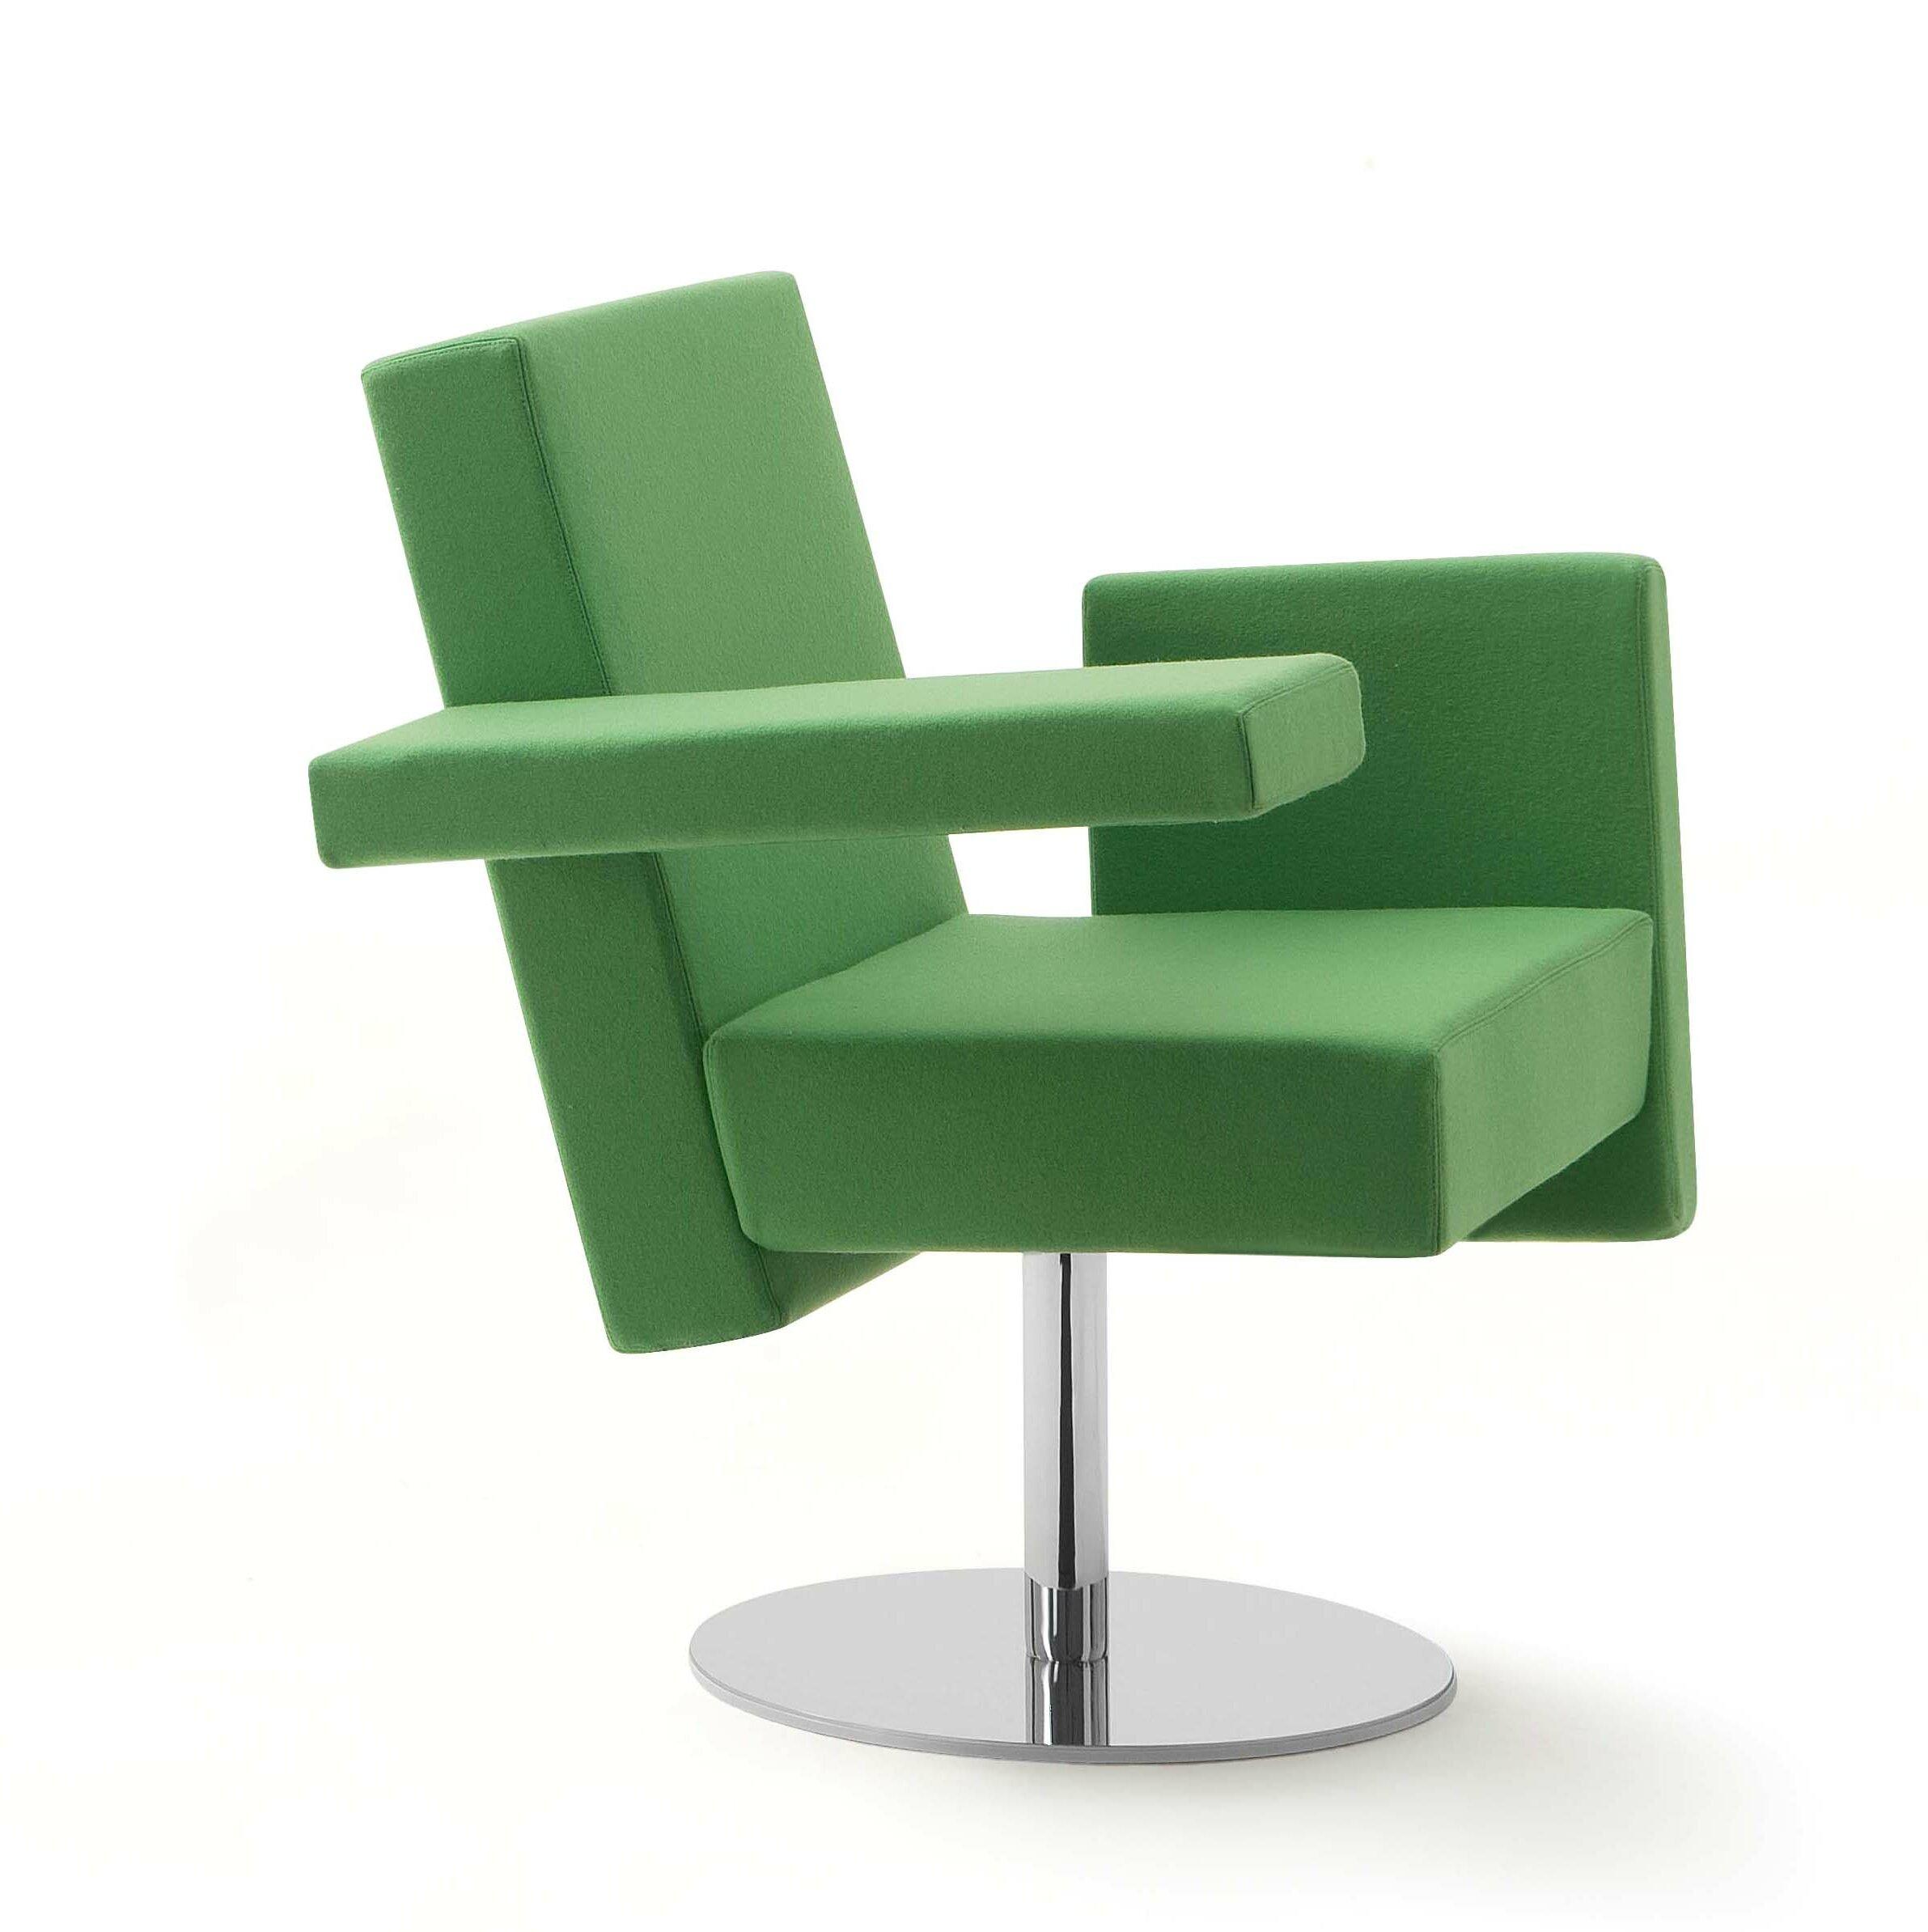 Groovy Meet Me Swivel Arm Guest Chair Theyellowbook Wood Chair Design Ideas Theyellowbookinfo